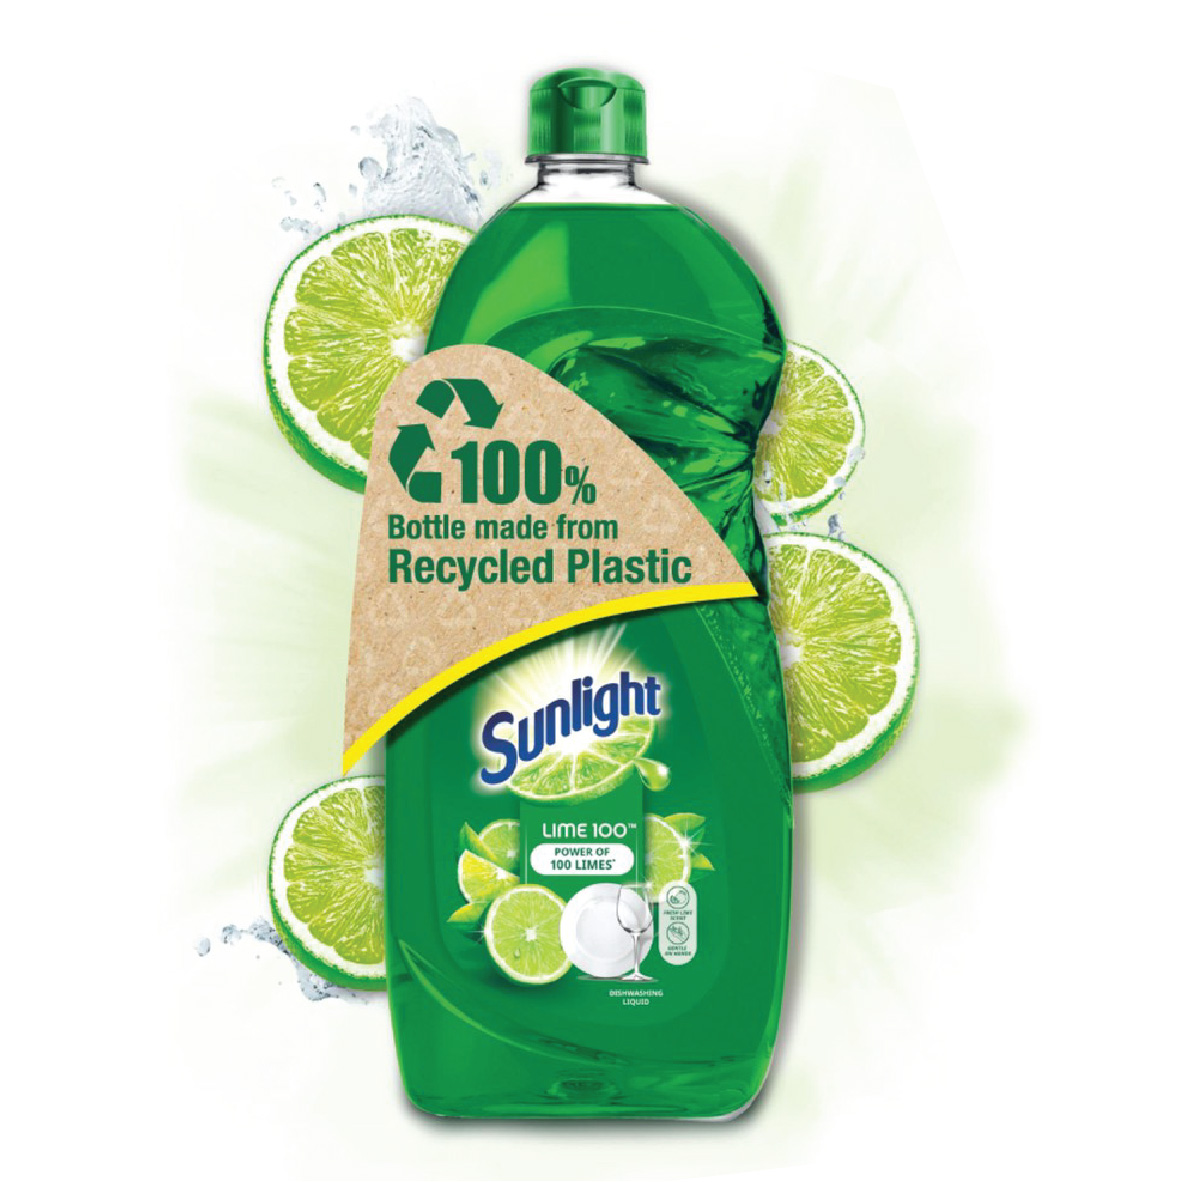 Sunlight Dishwashing Liquid Lime 100 - 900ml